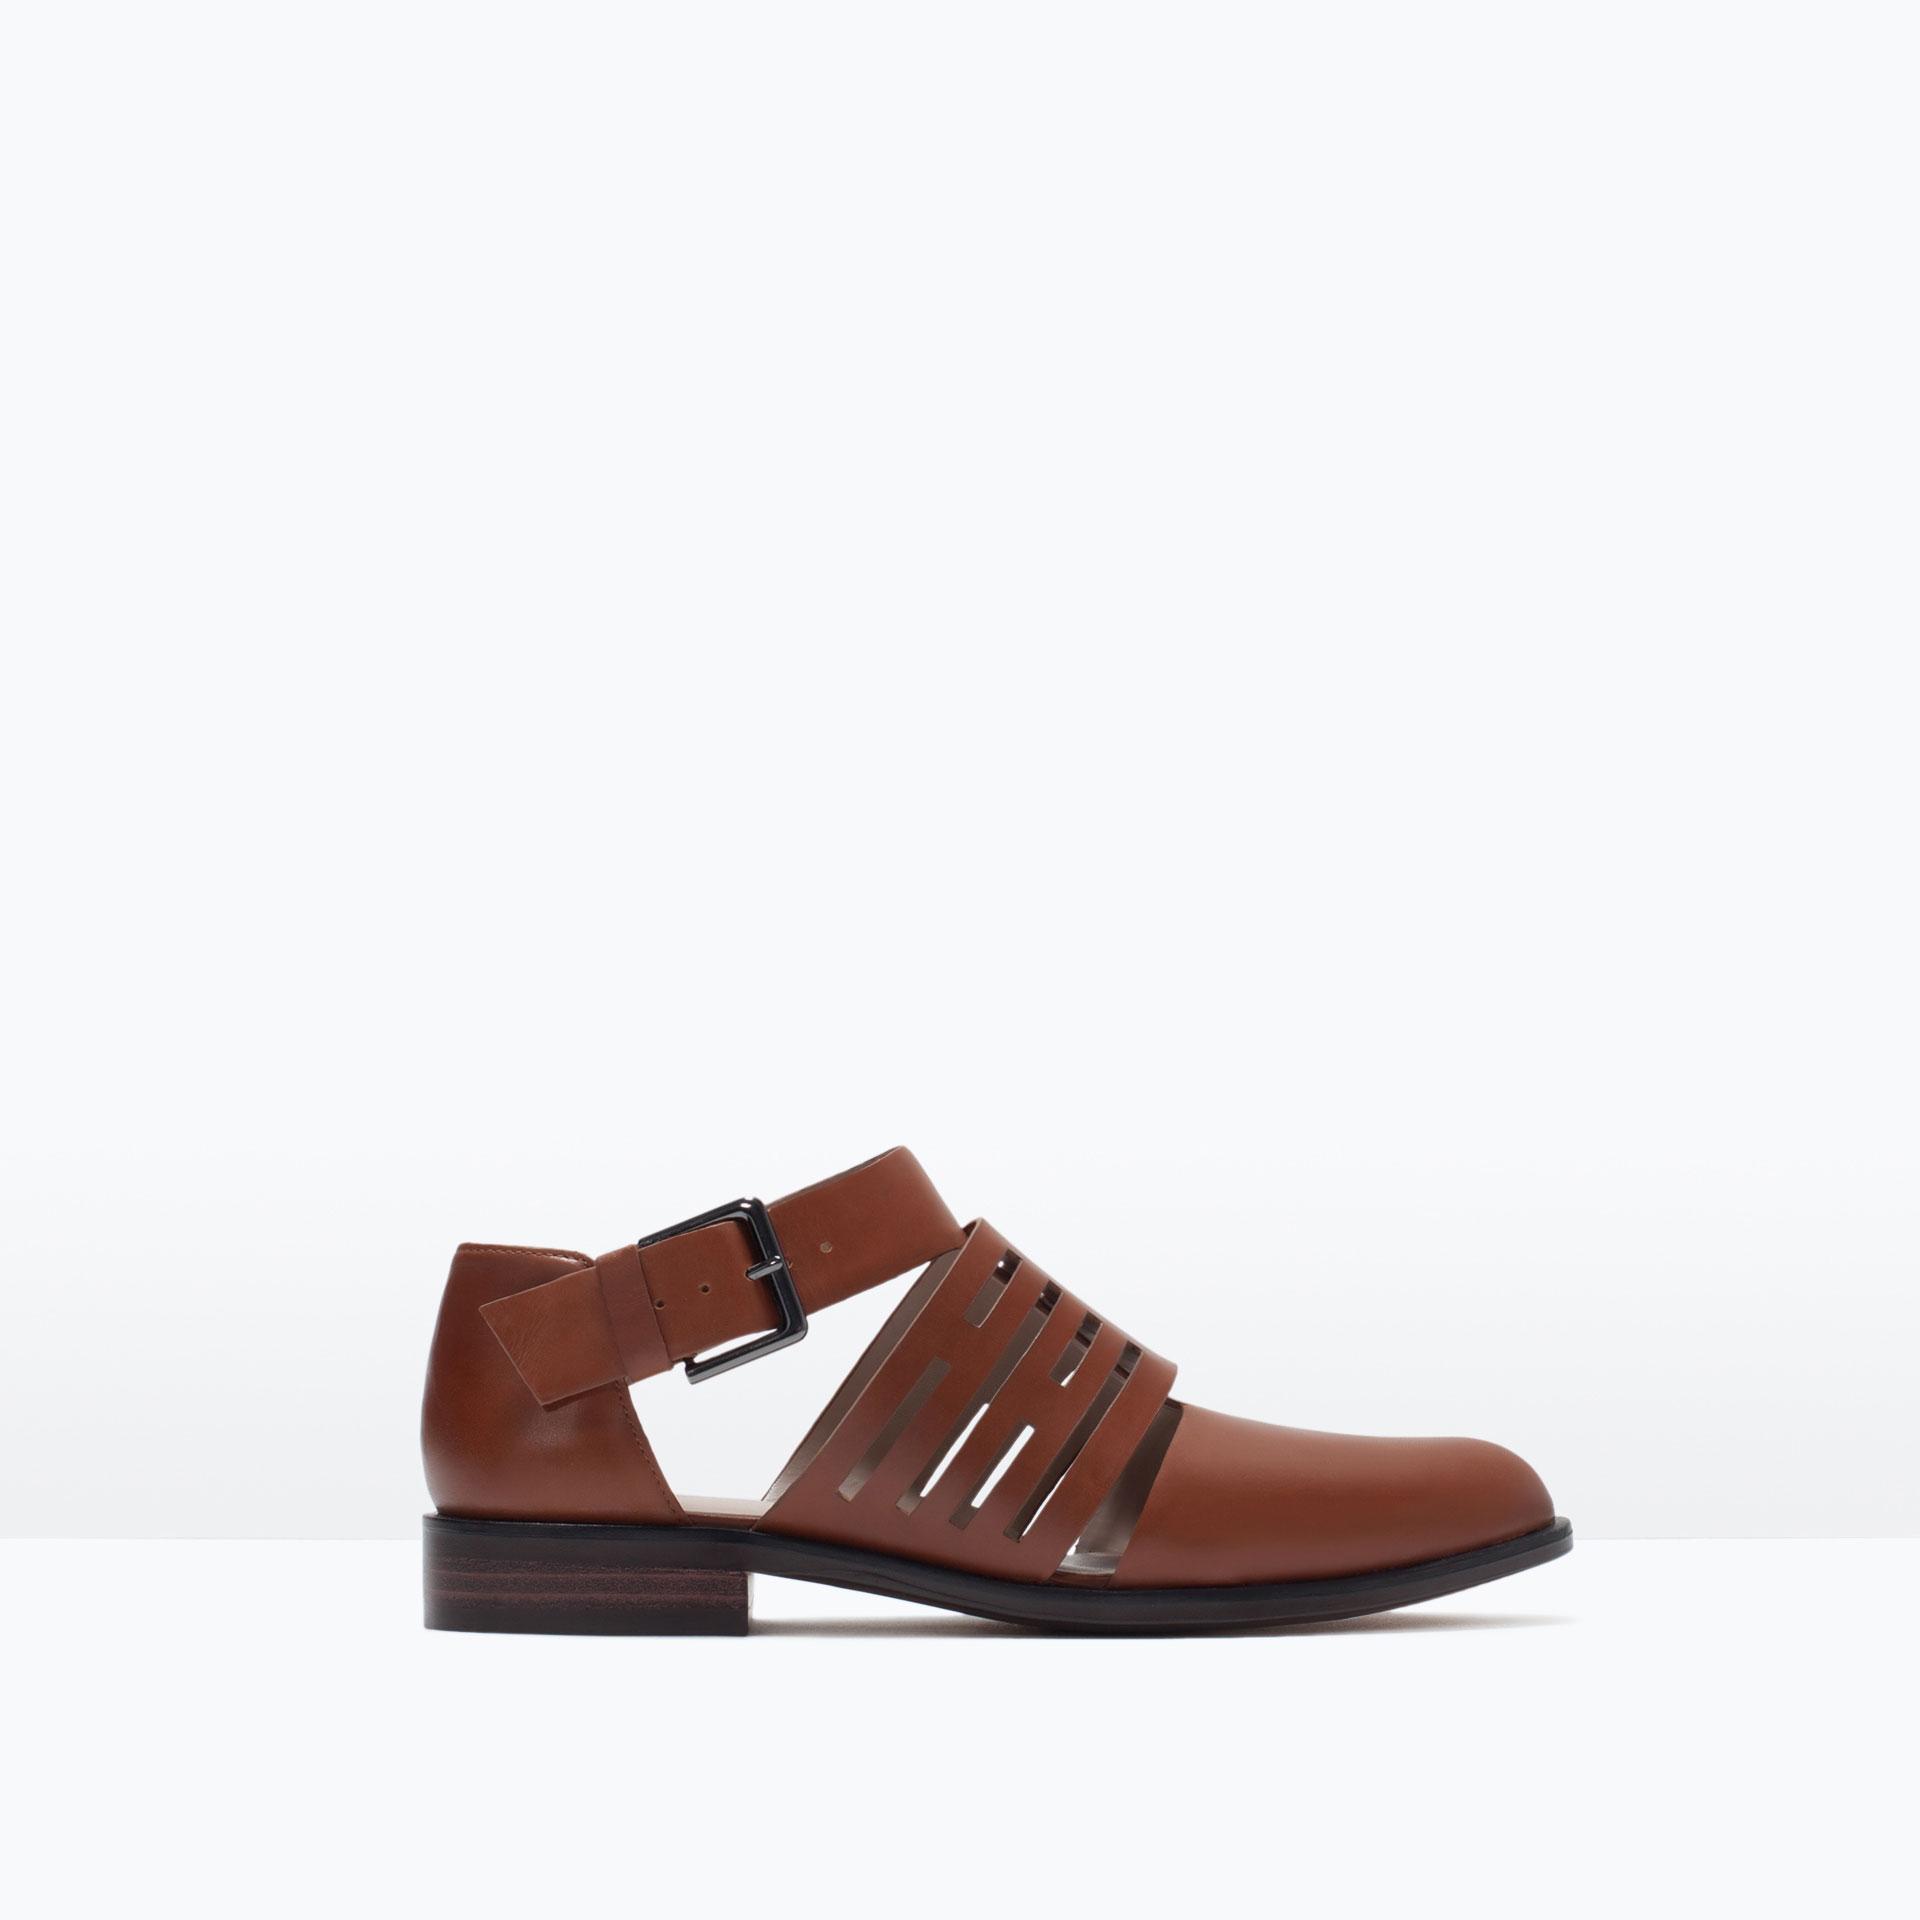 zara flat leather cutout shoes flat leather cutout shoes